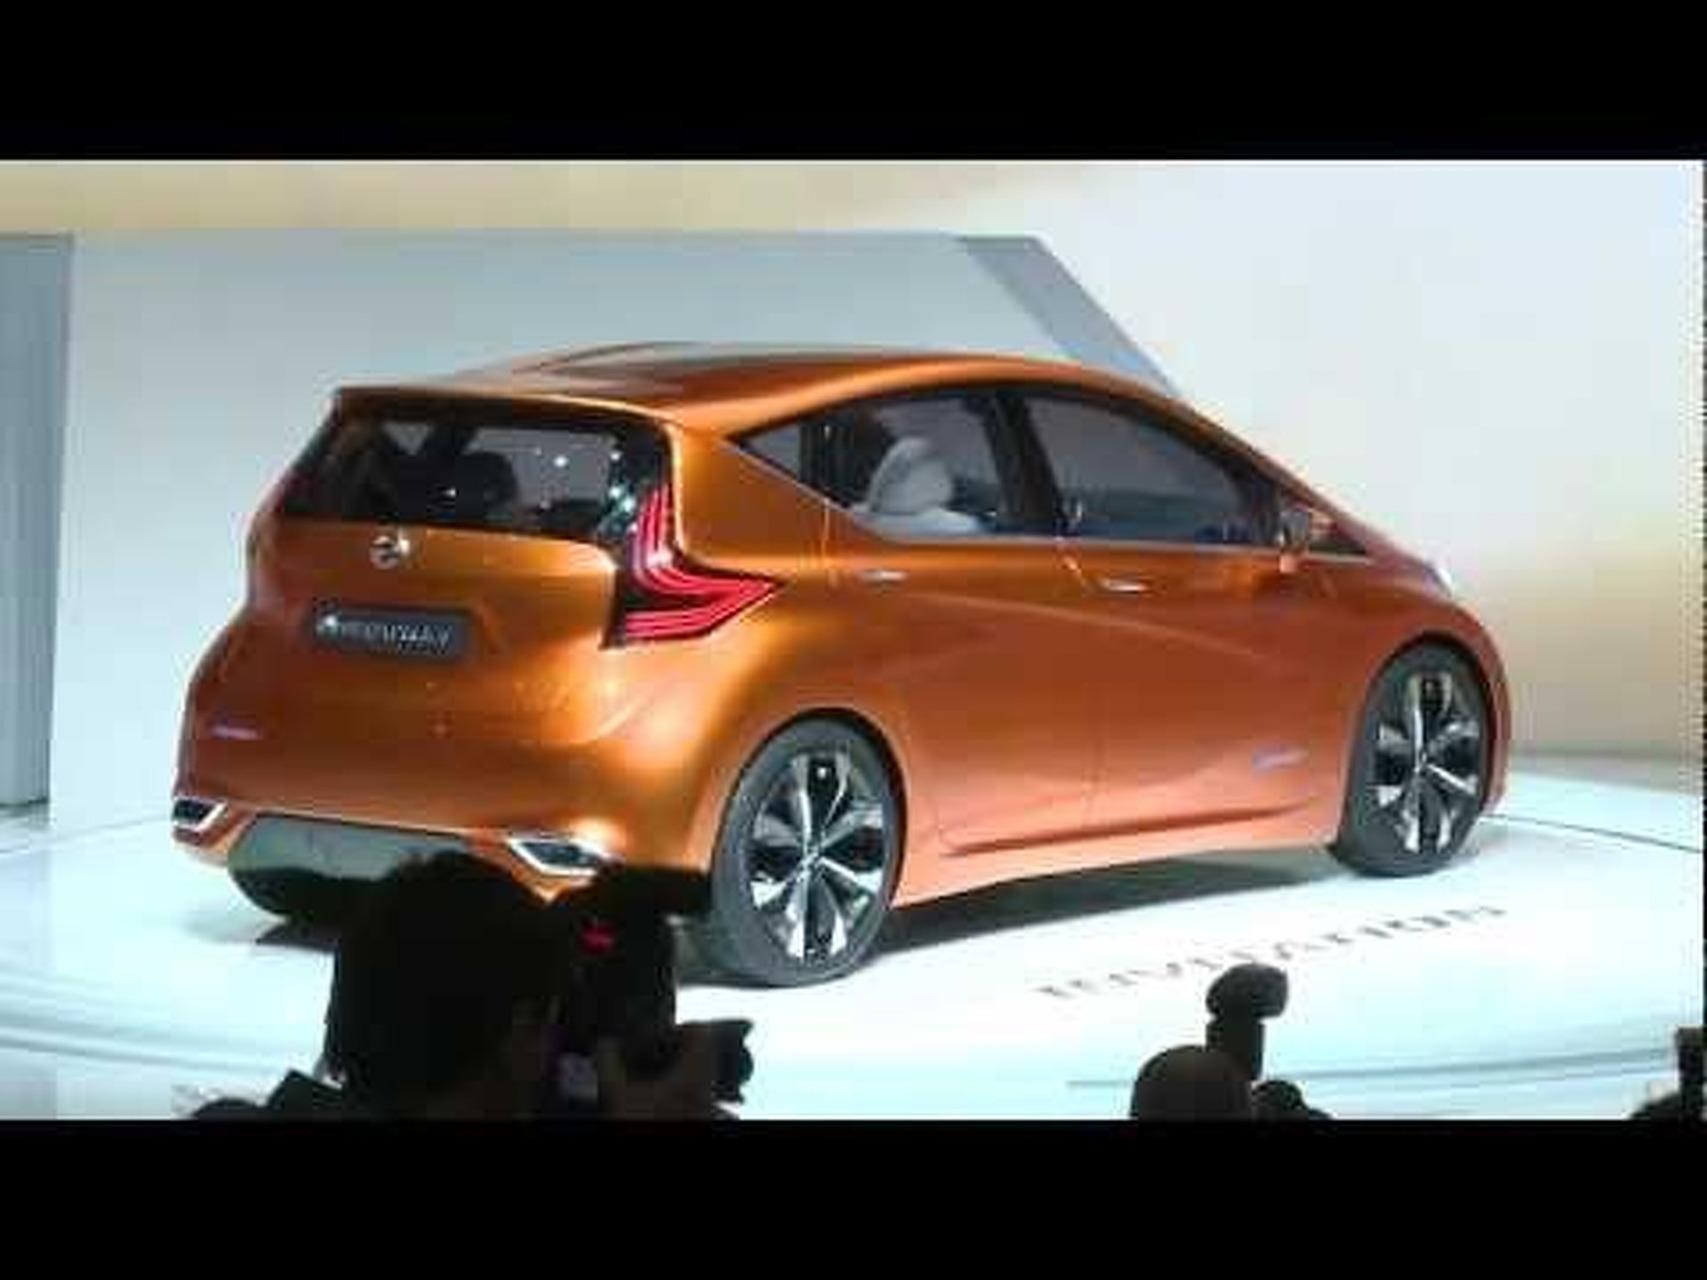 Nissan Invitation Concept at the 2012 Geneva Motor Show